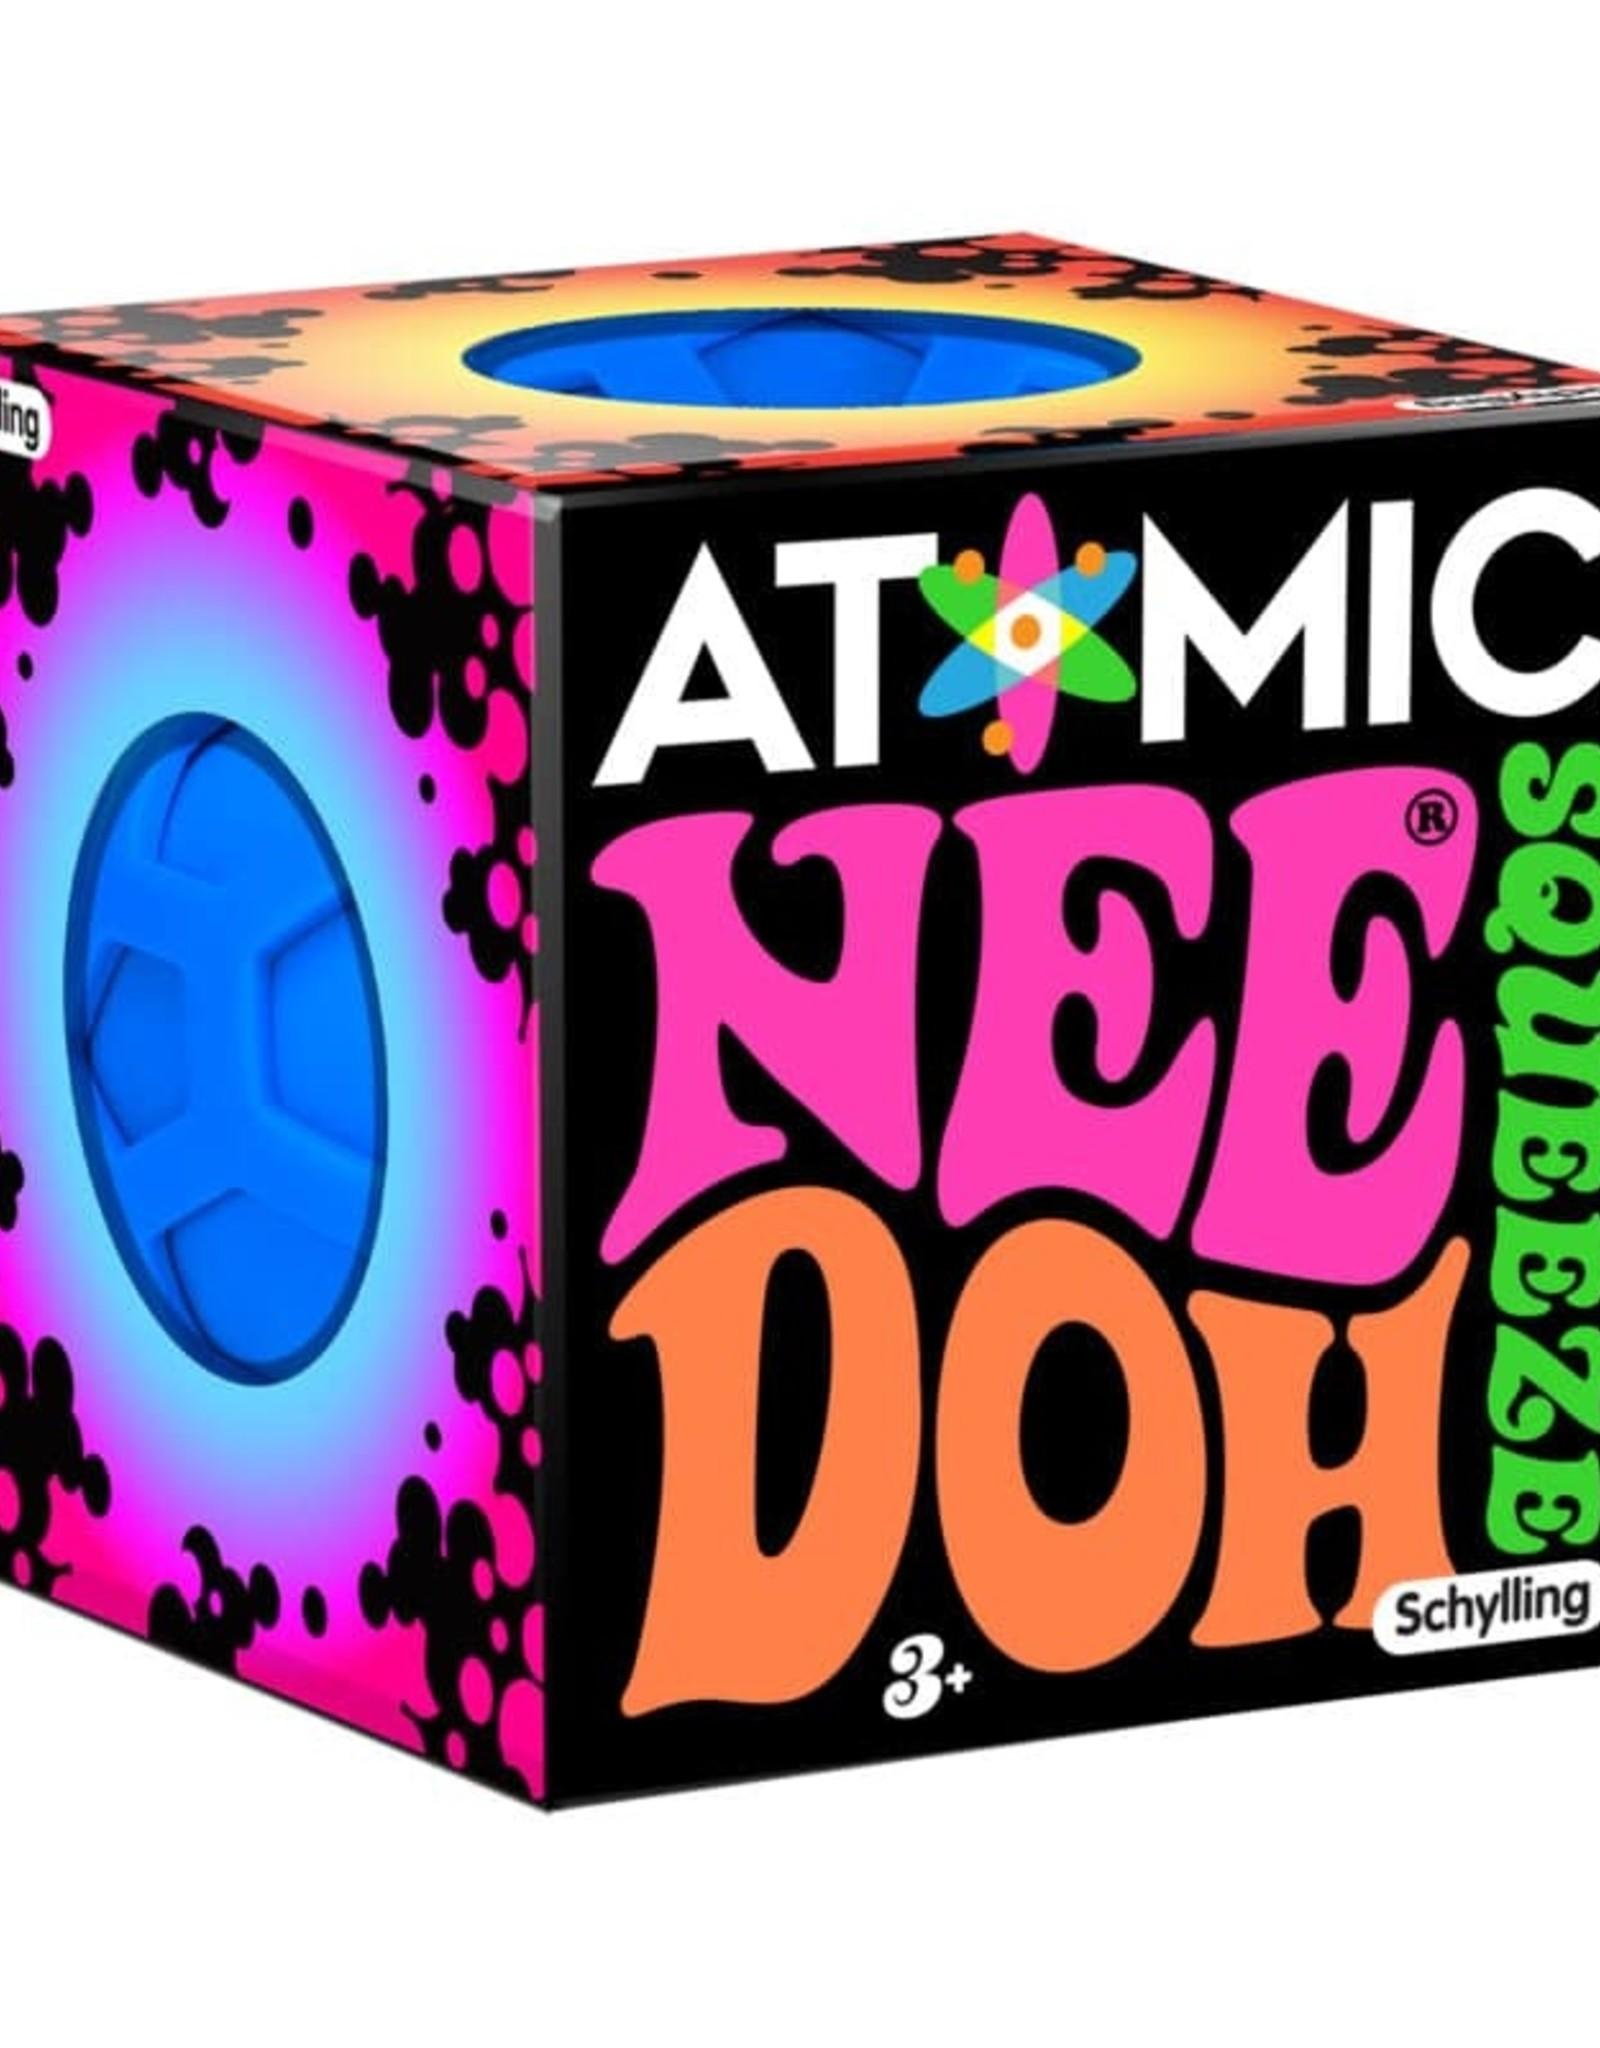 Nee-Doh Atomic Nee Doh